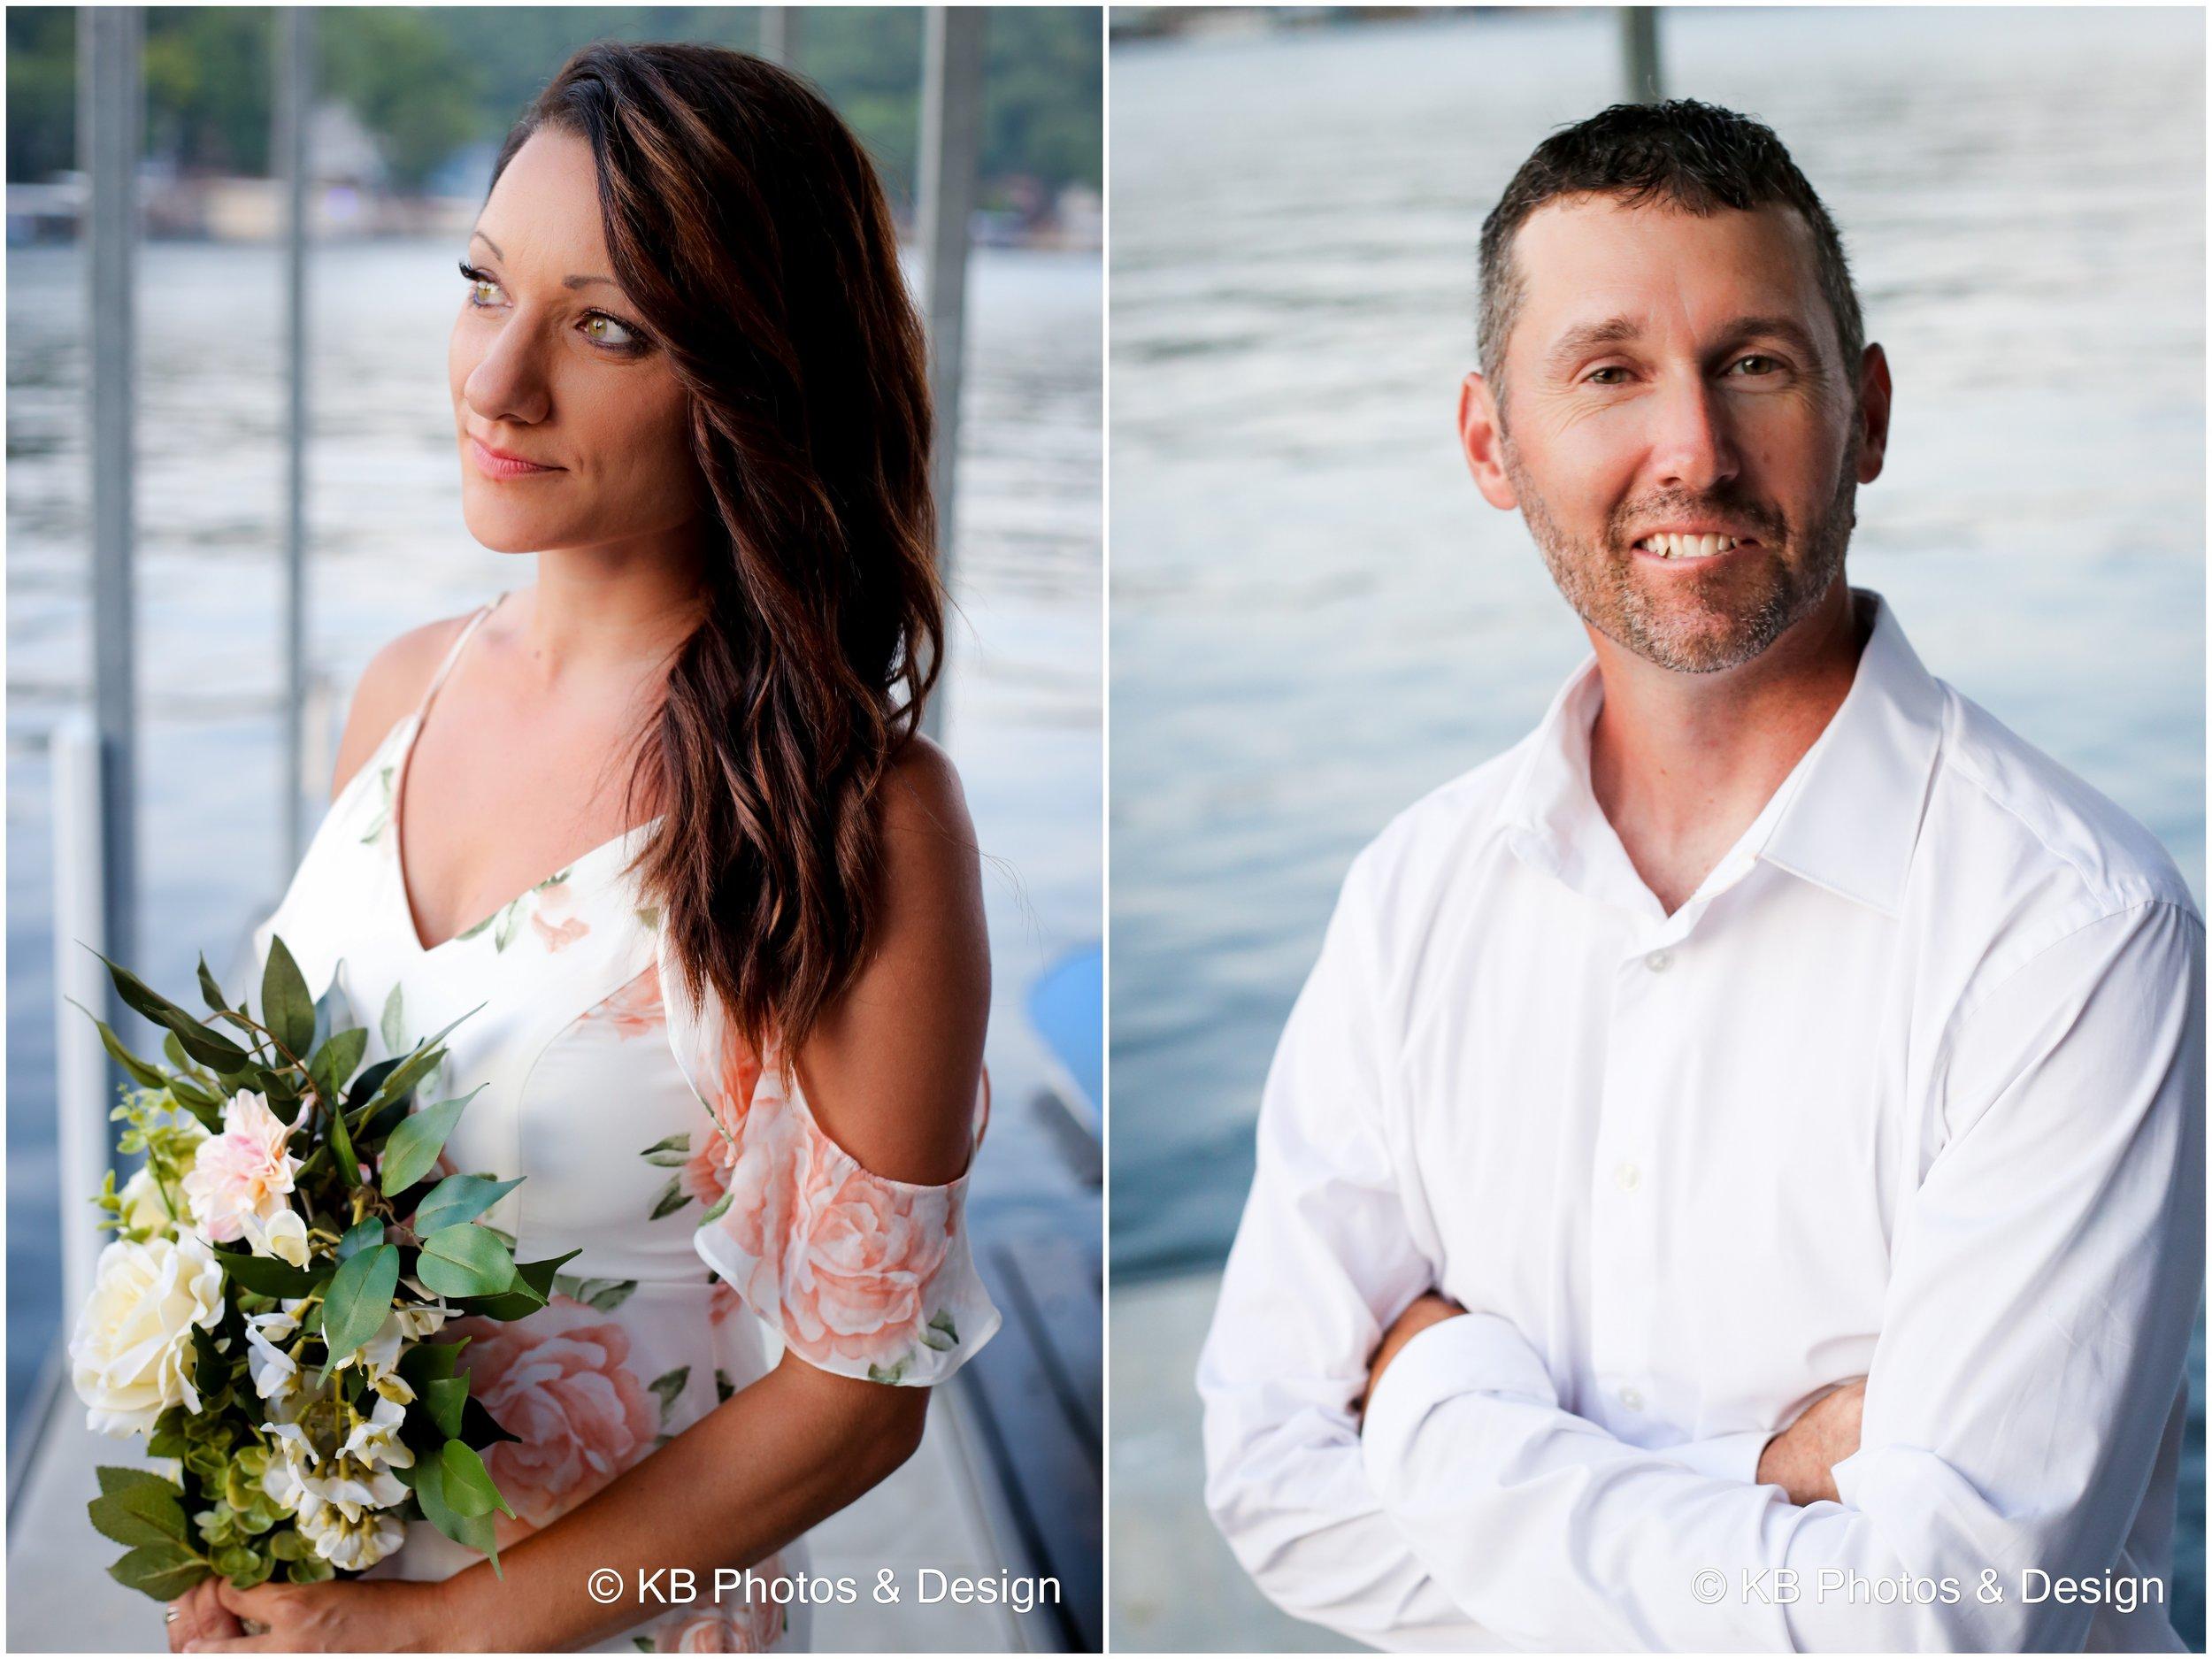 Jeff Kayla bride groom_KB Photos and Design 1.jpg